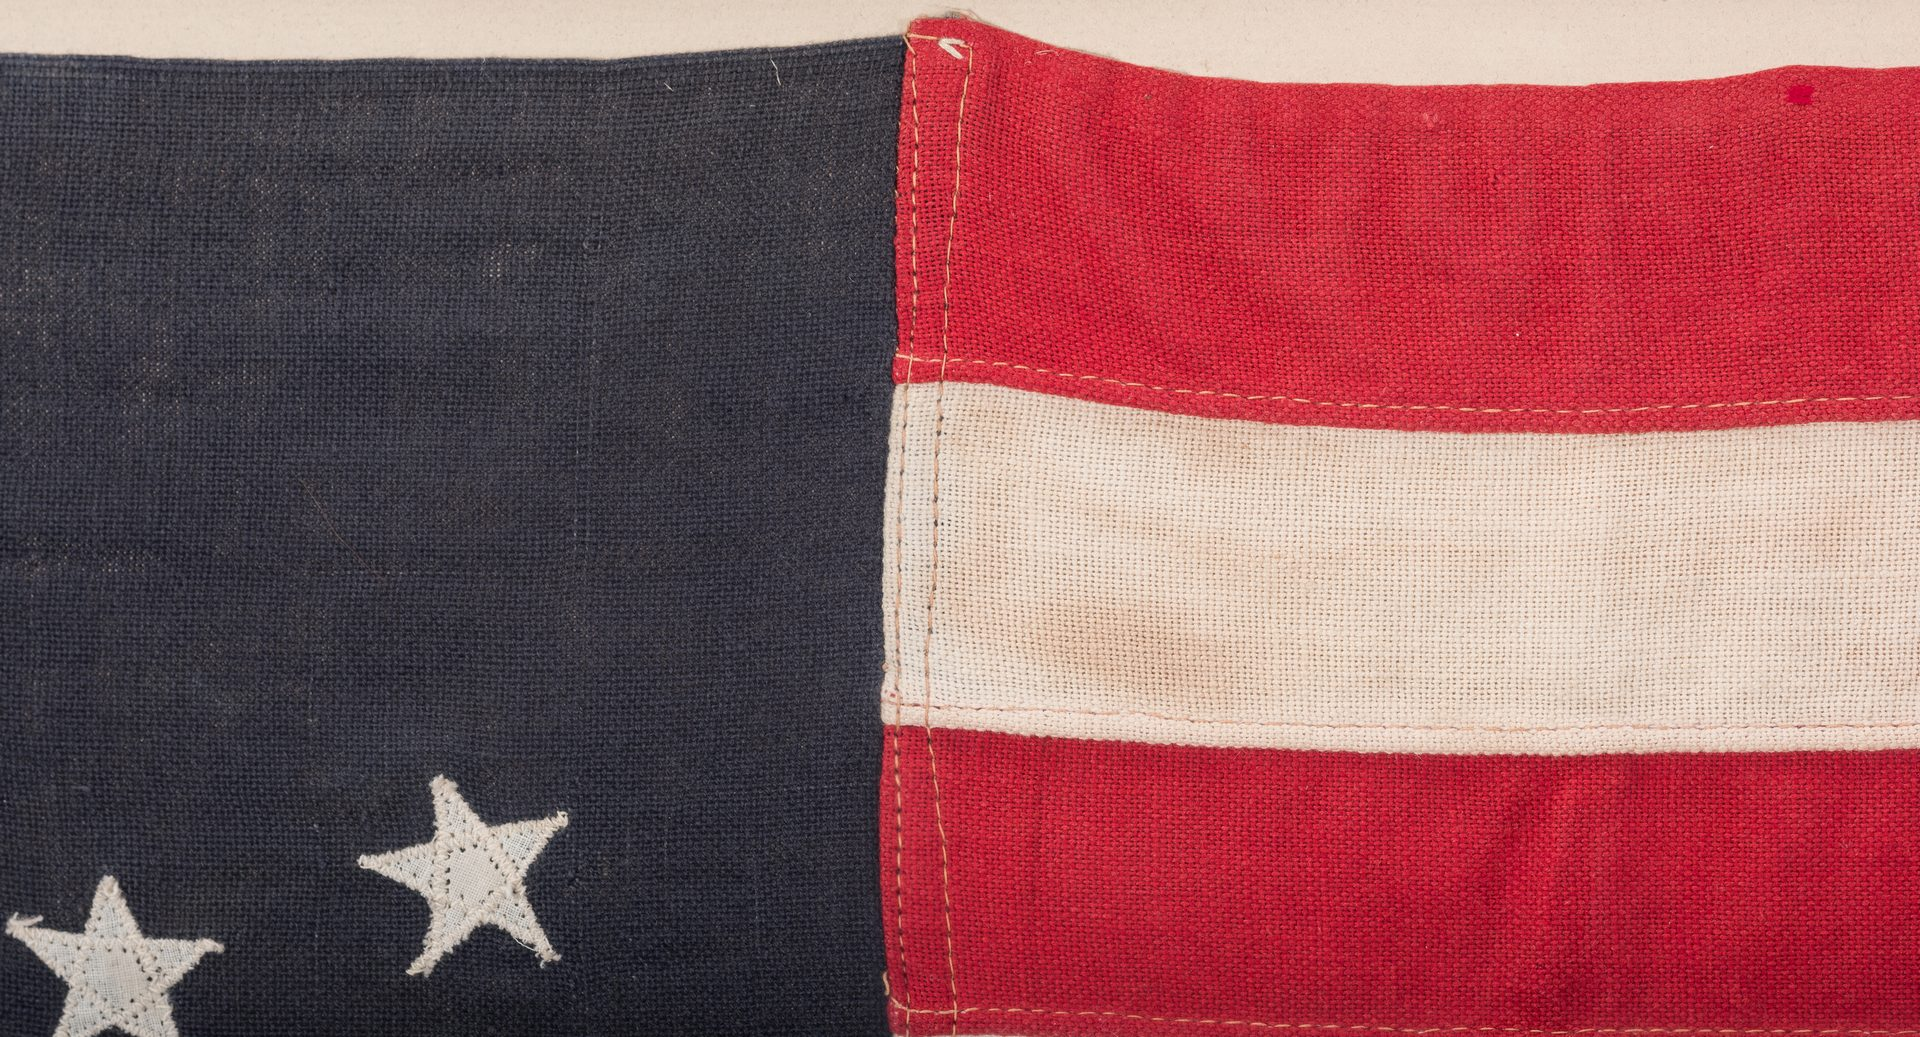 Lot 493: 15 Star Kentucky Statehood Commemoration Flag